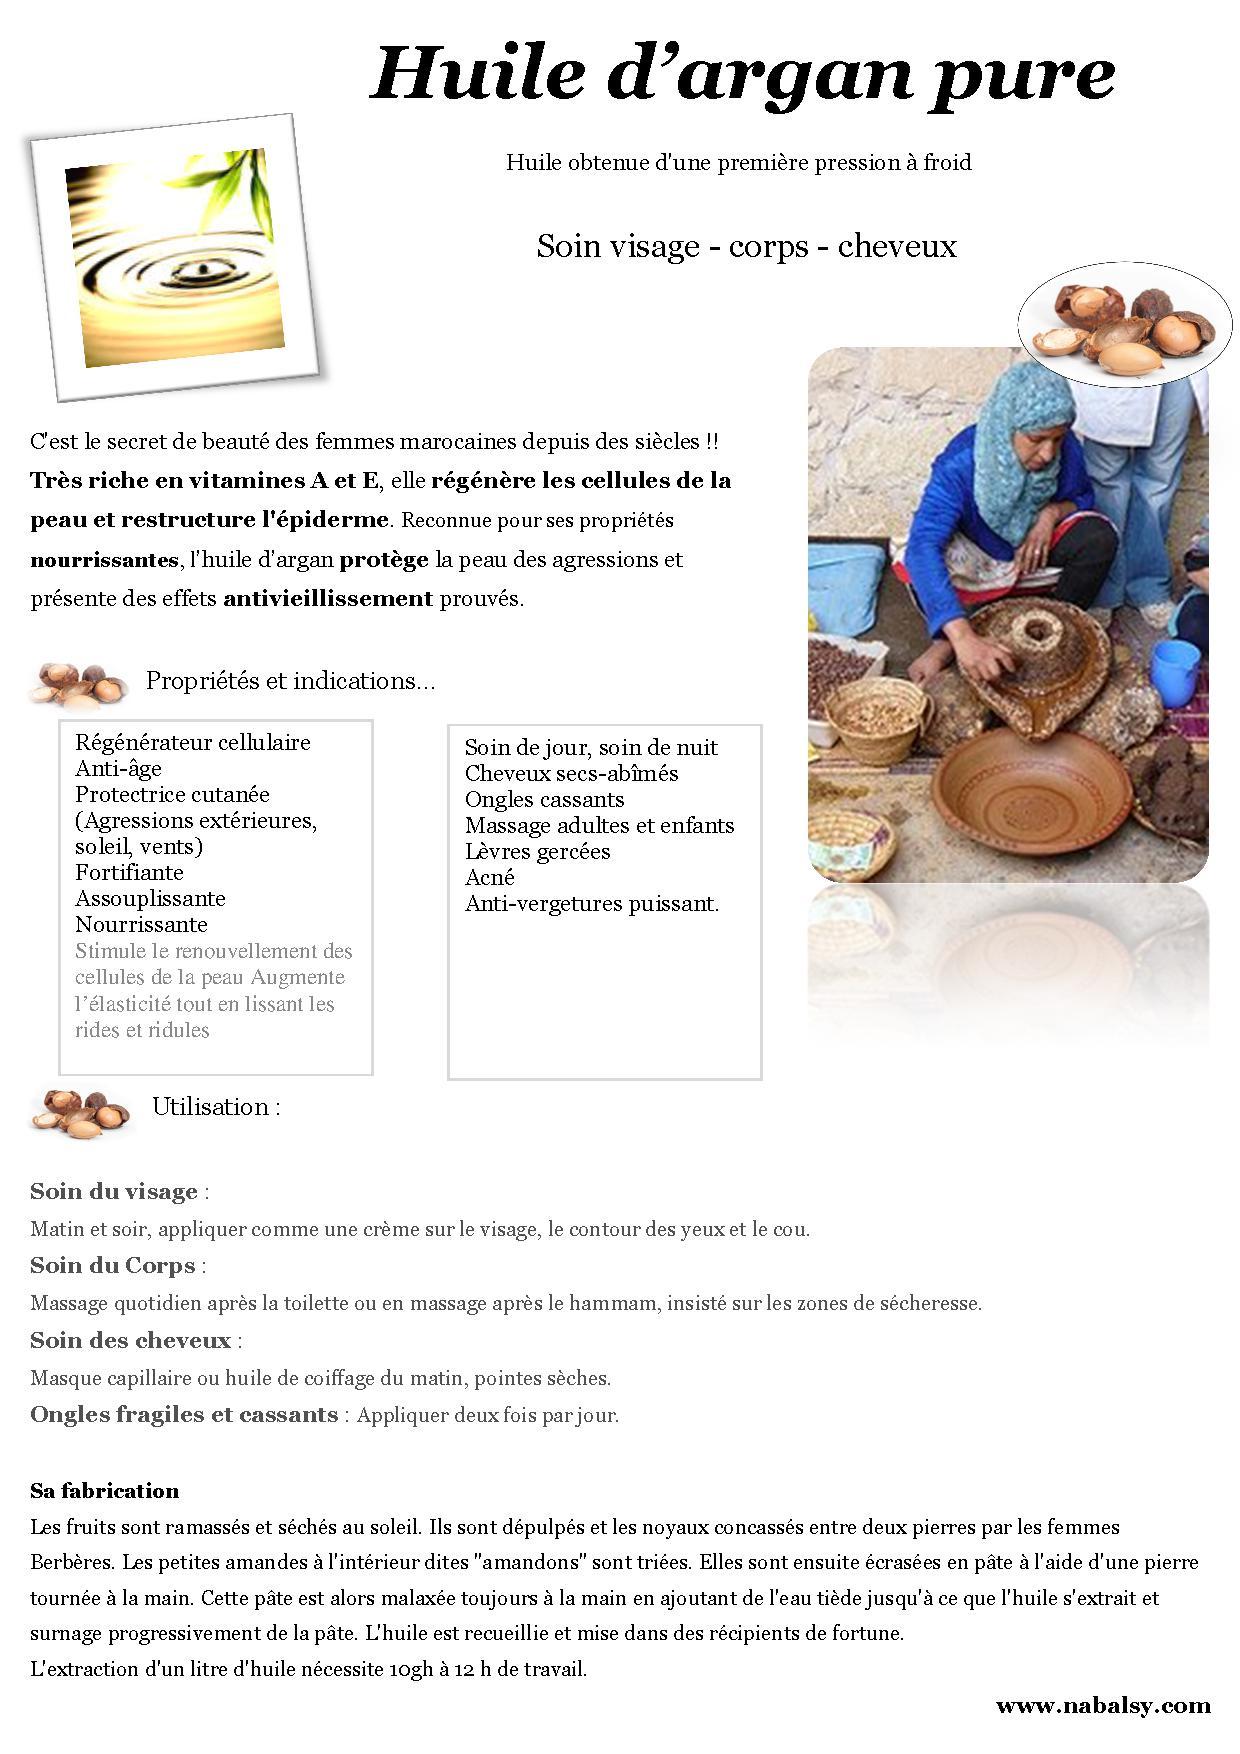 huile d'argan - nabalsy.com